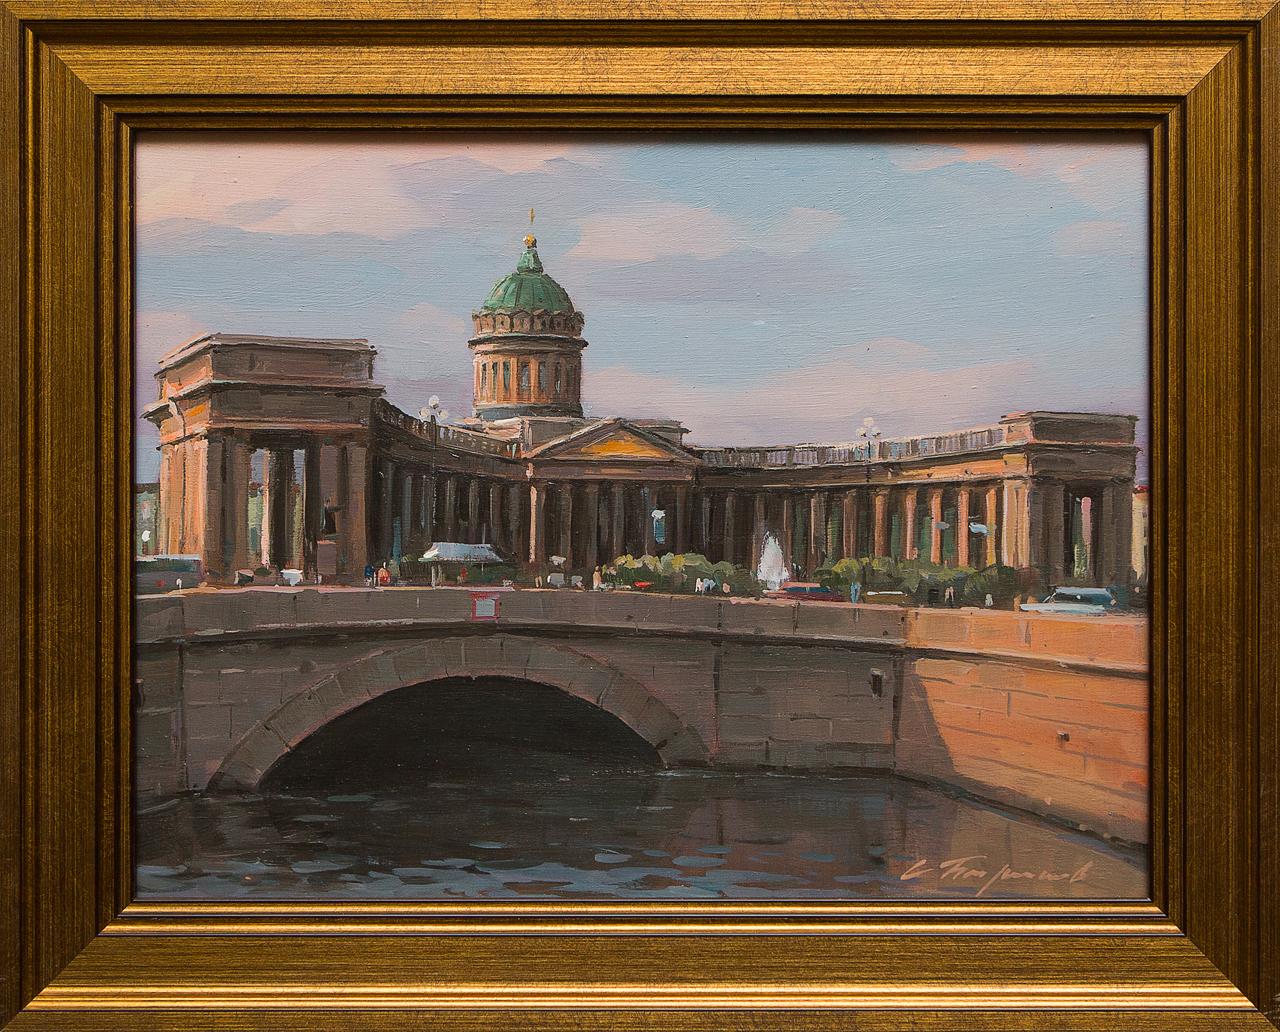 Картина маслом Казанский собор Бирюков картина маслом казанский собор иванченков